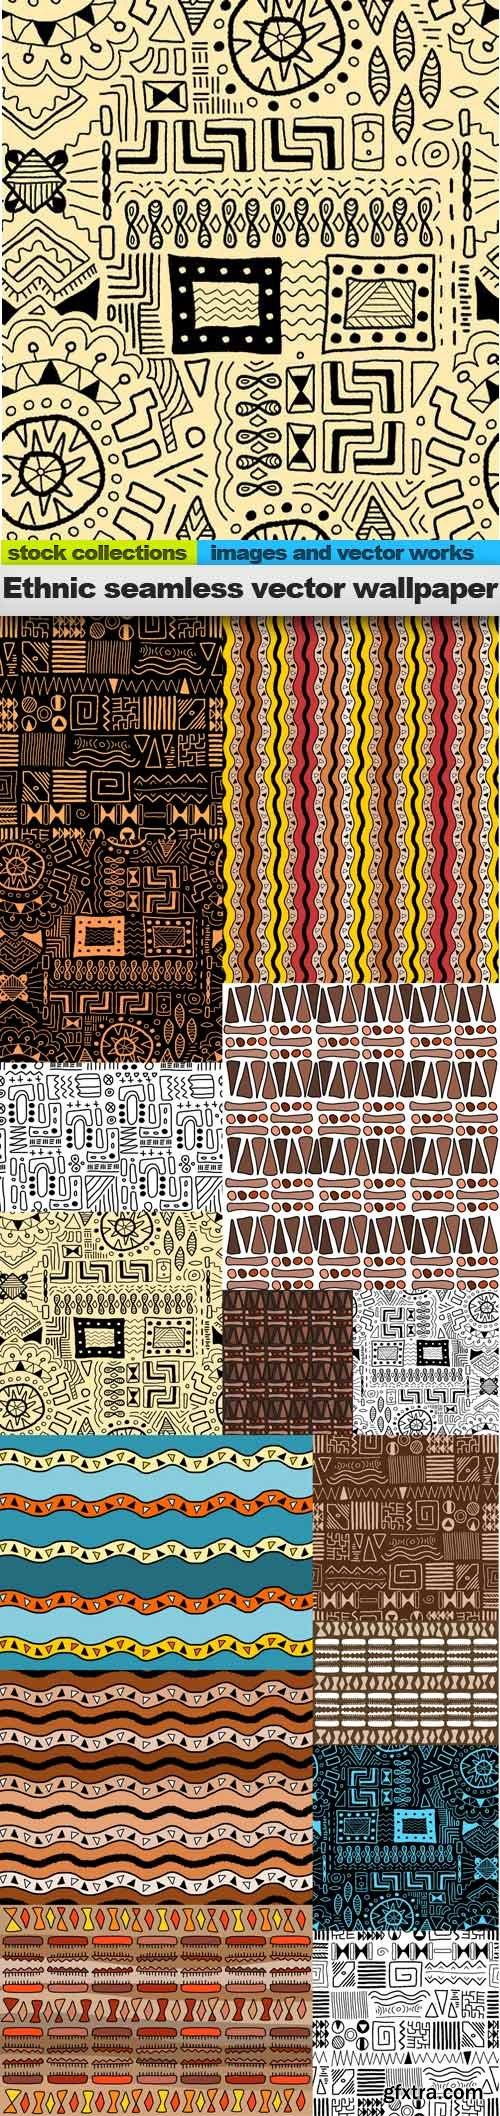 Ethnic seamless vector wallpaper, 15 x EPS